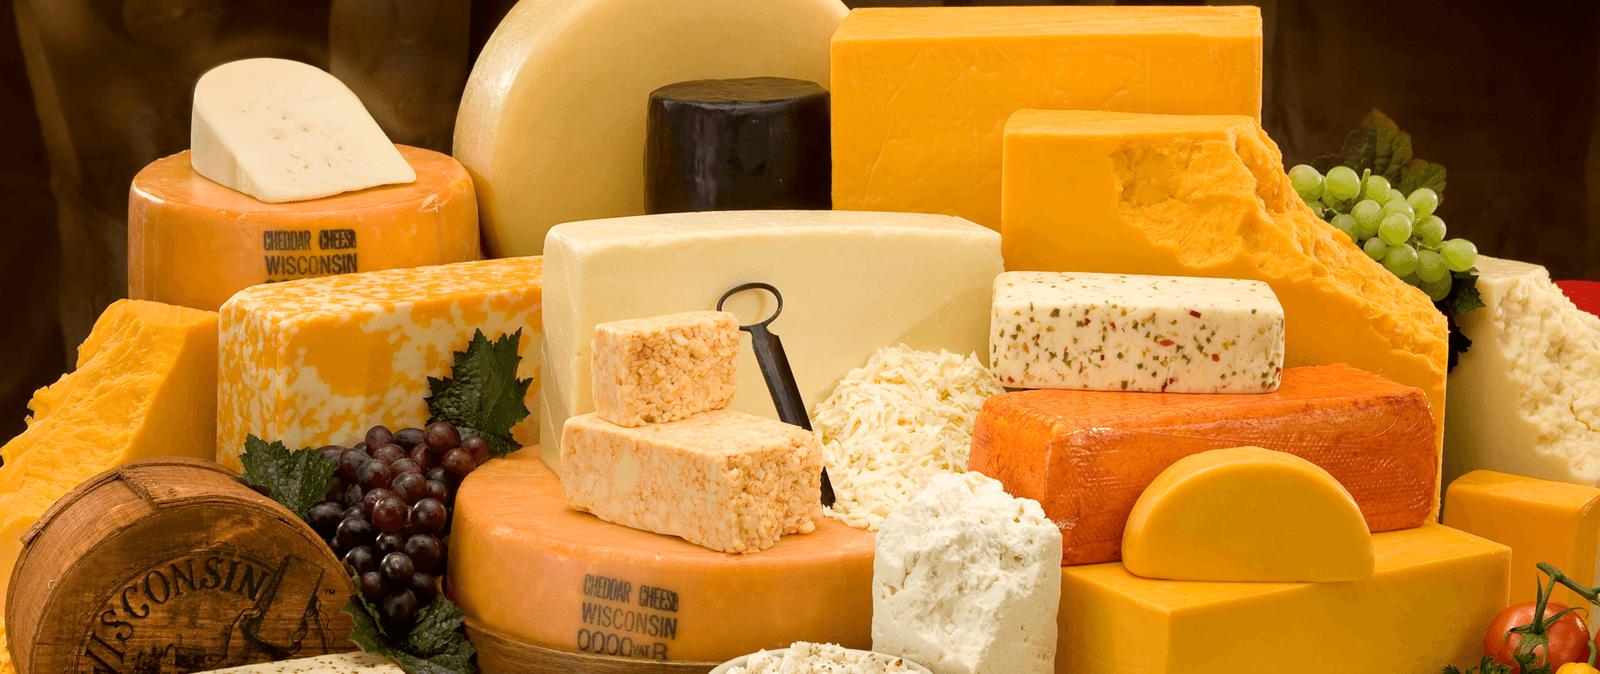 High Resolution Wallpaper | Cheese 1600x674 px